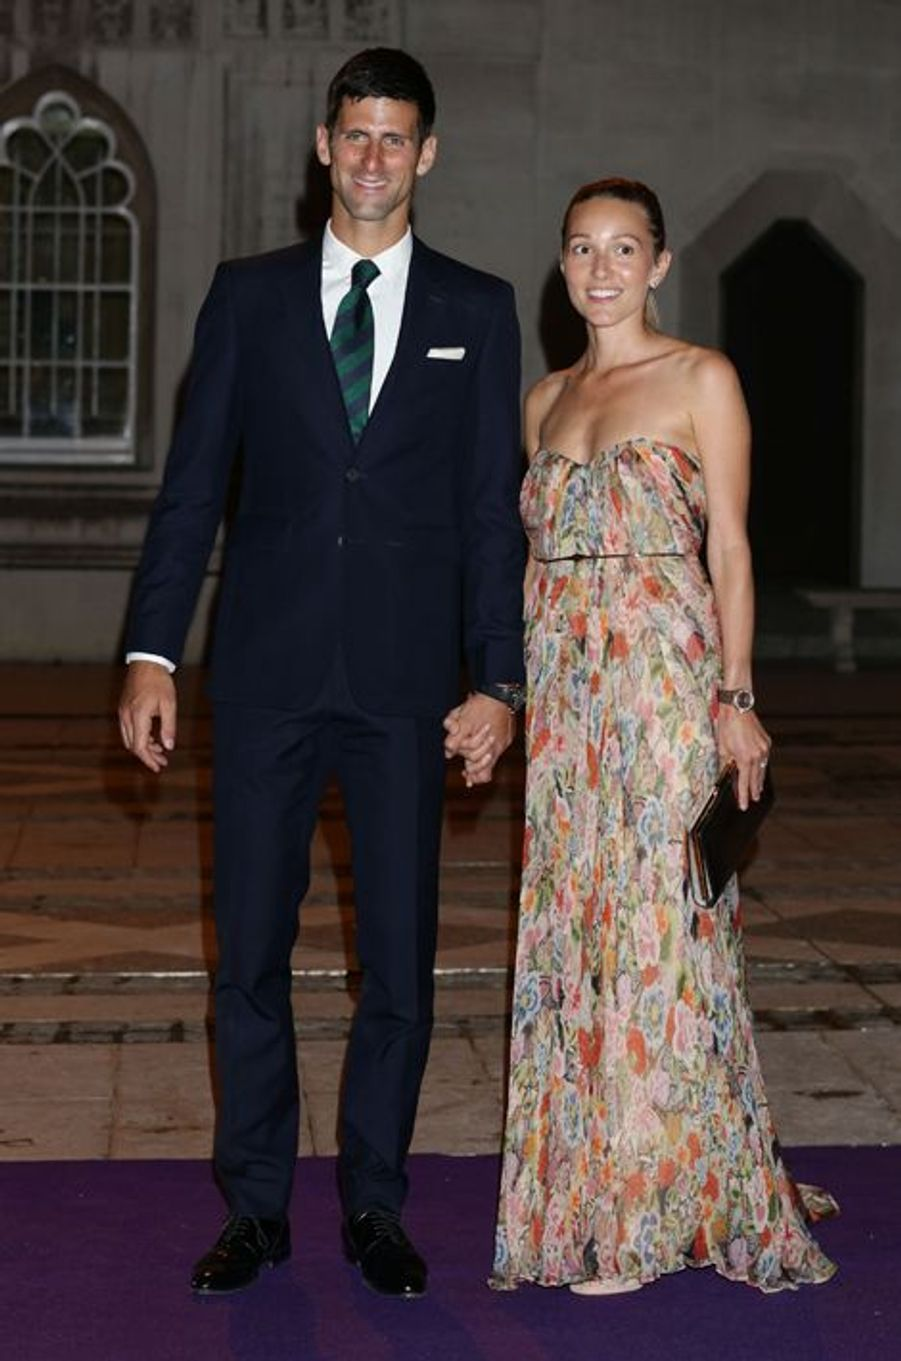 Novak et Jelena Djokovic à Londres le 12 juillet 2015